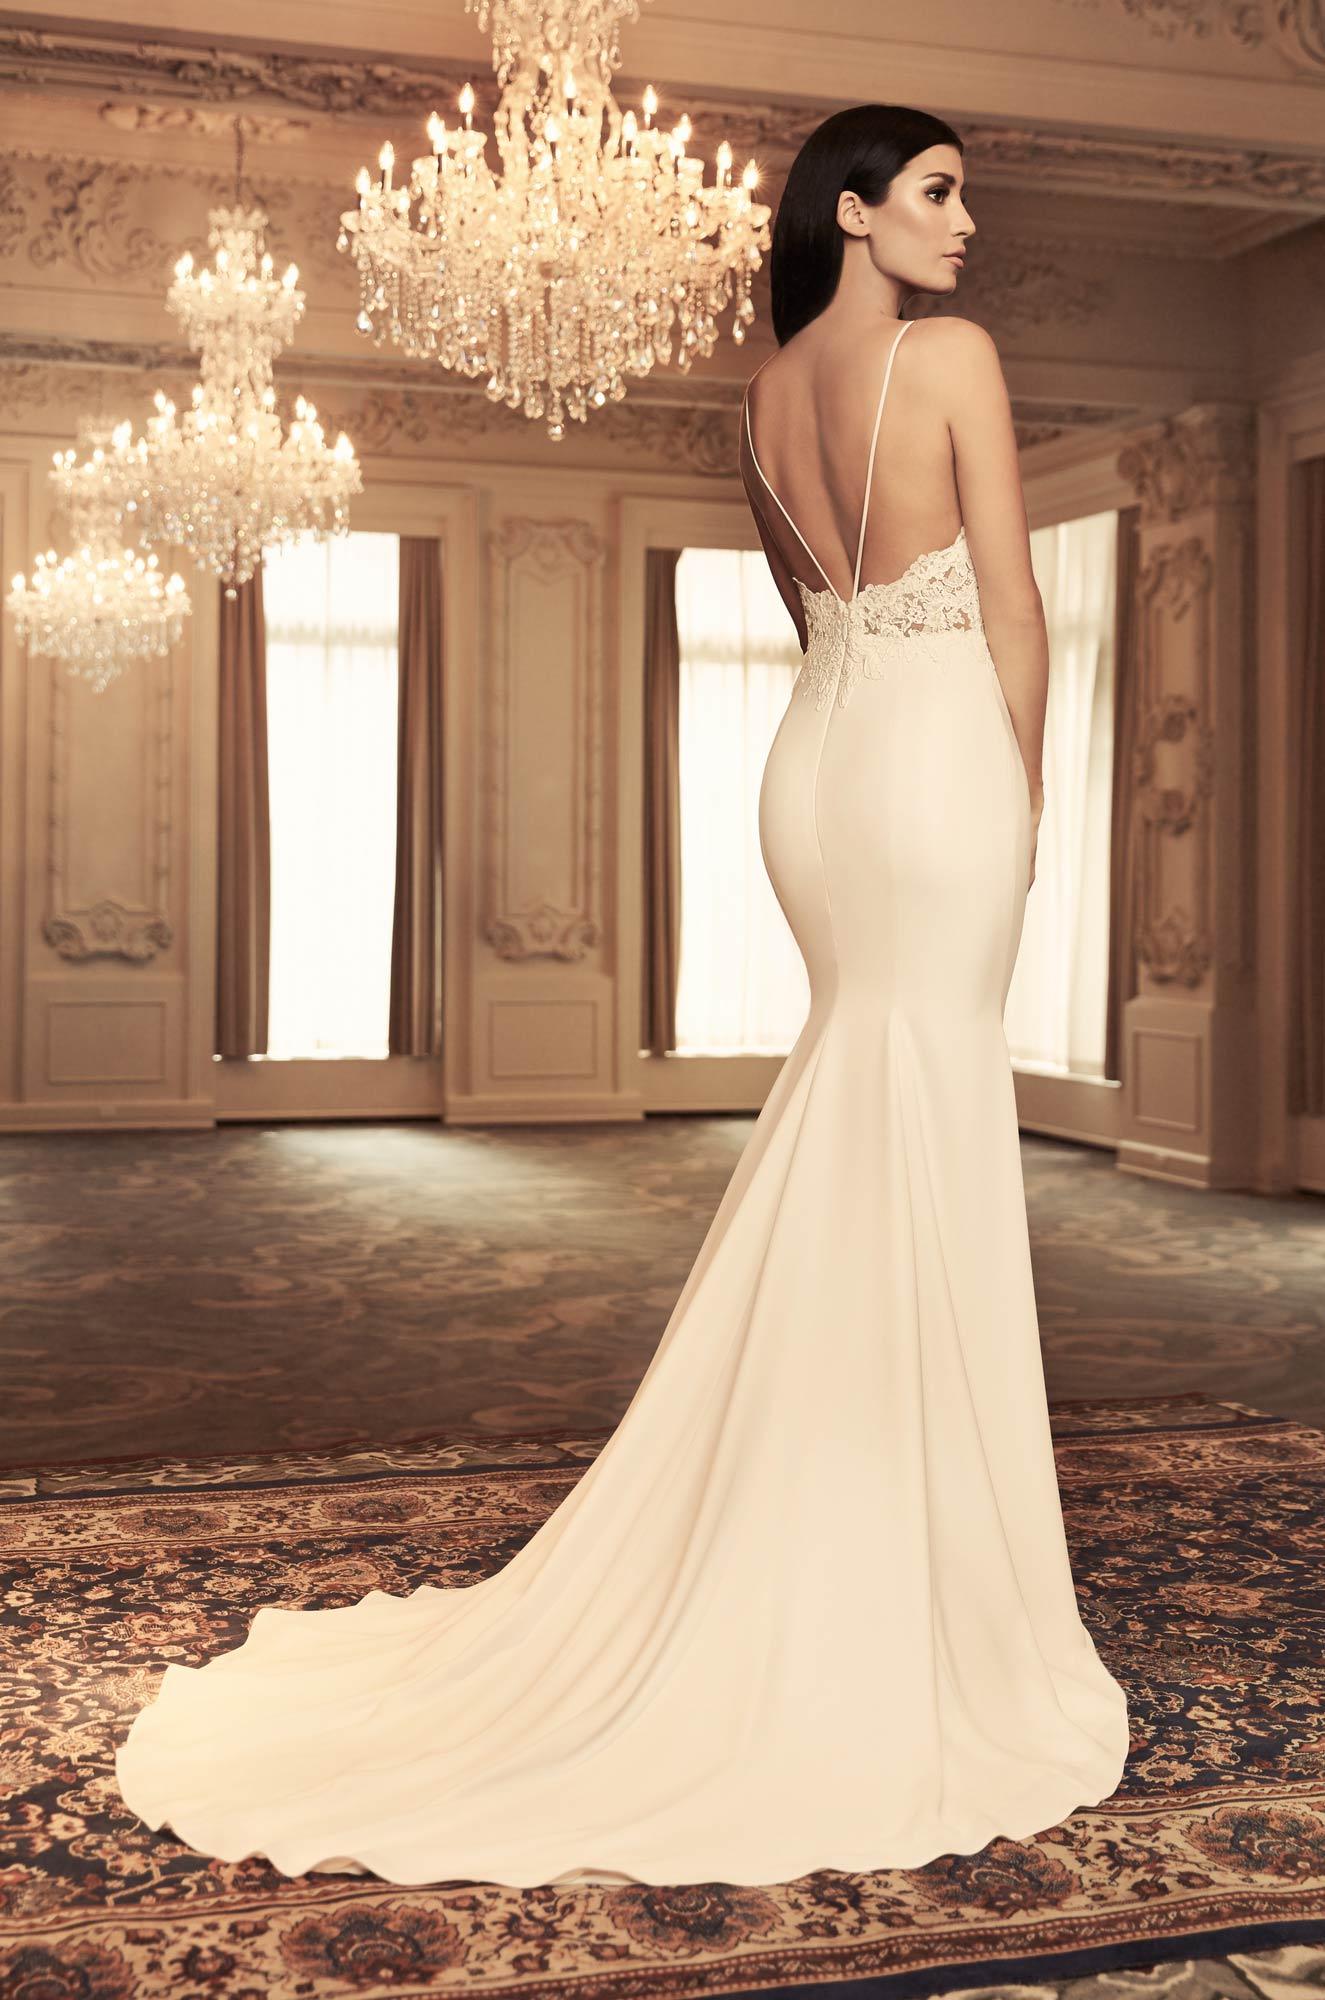 Spaghetti Strap Lace And Crepe Sheath Wedding Dress With Leg Slit